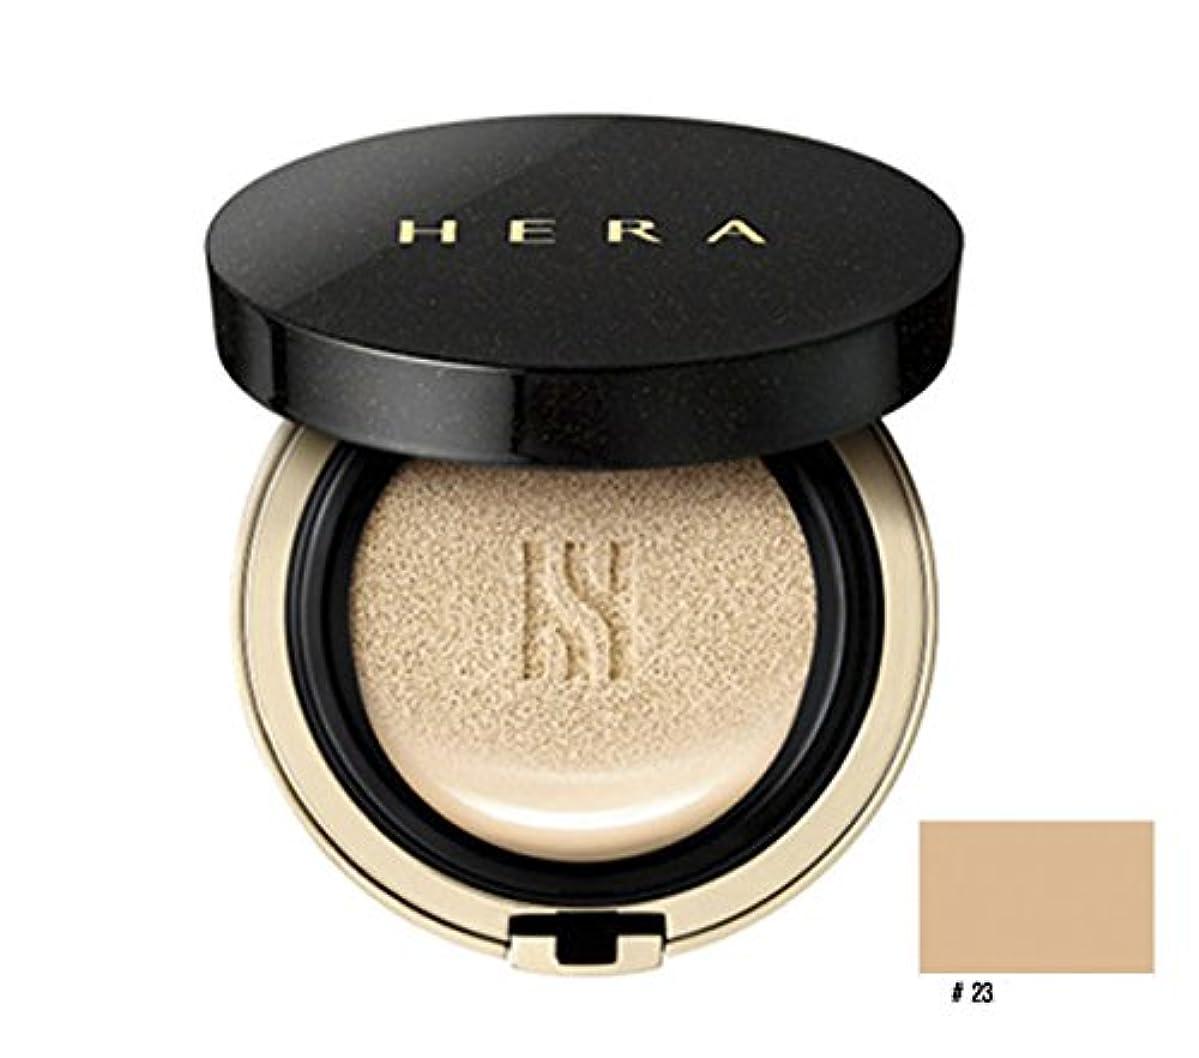 胚取る詩人Hera ブラッククッション SPF34/PA++ 本品15g+リフィール15g/Black Cushion SPF34/PA++ 15g+Refil15g (No.23 beige) (韓国直発送) + Ochloo...